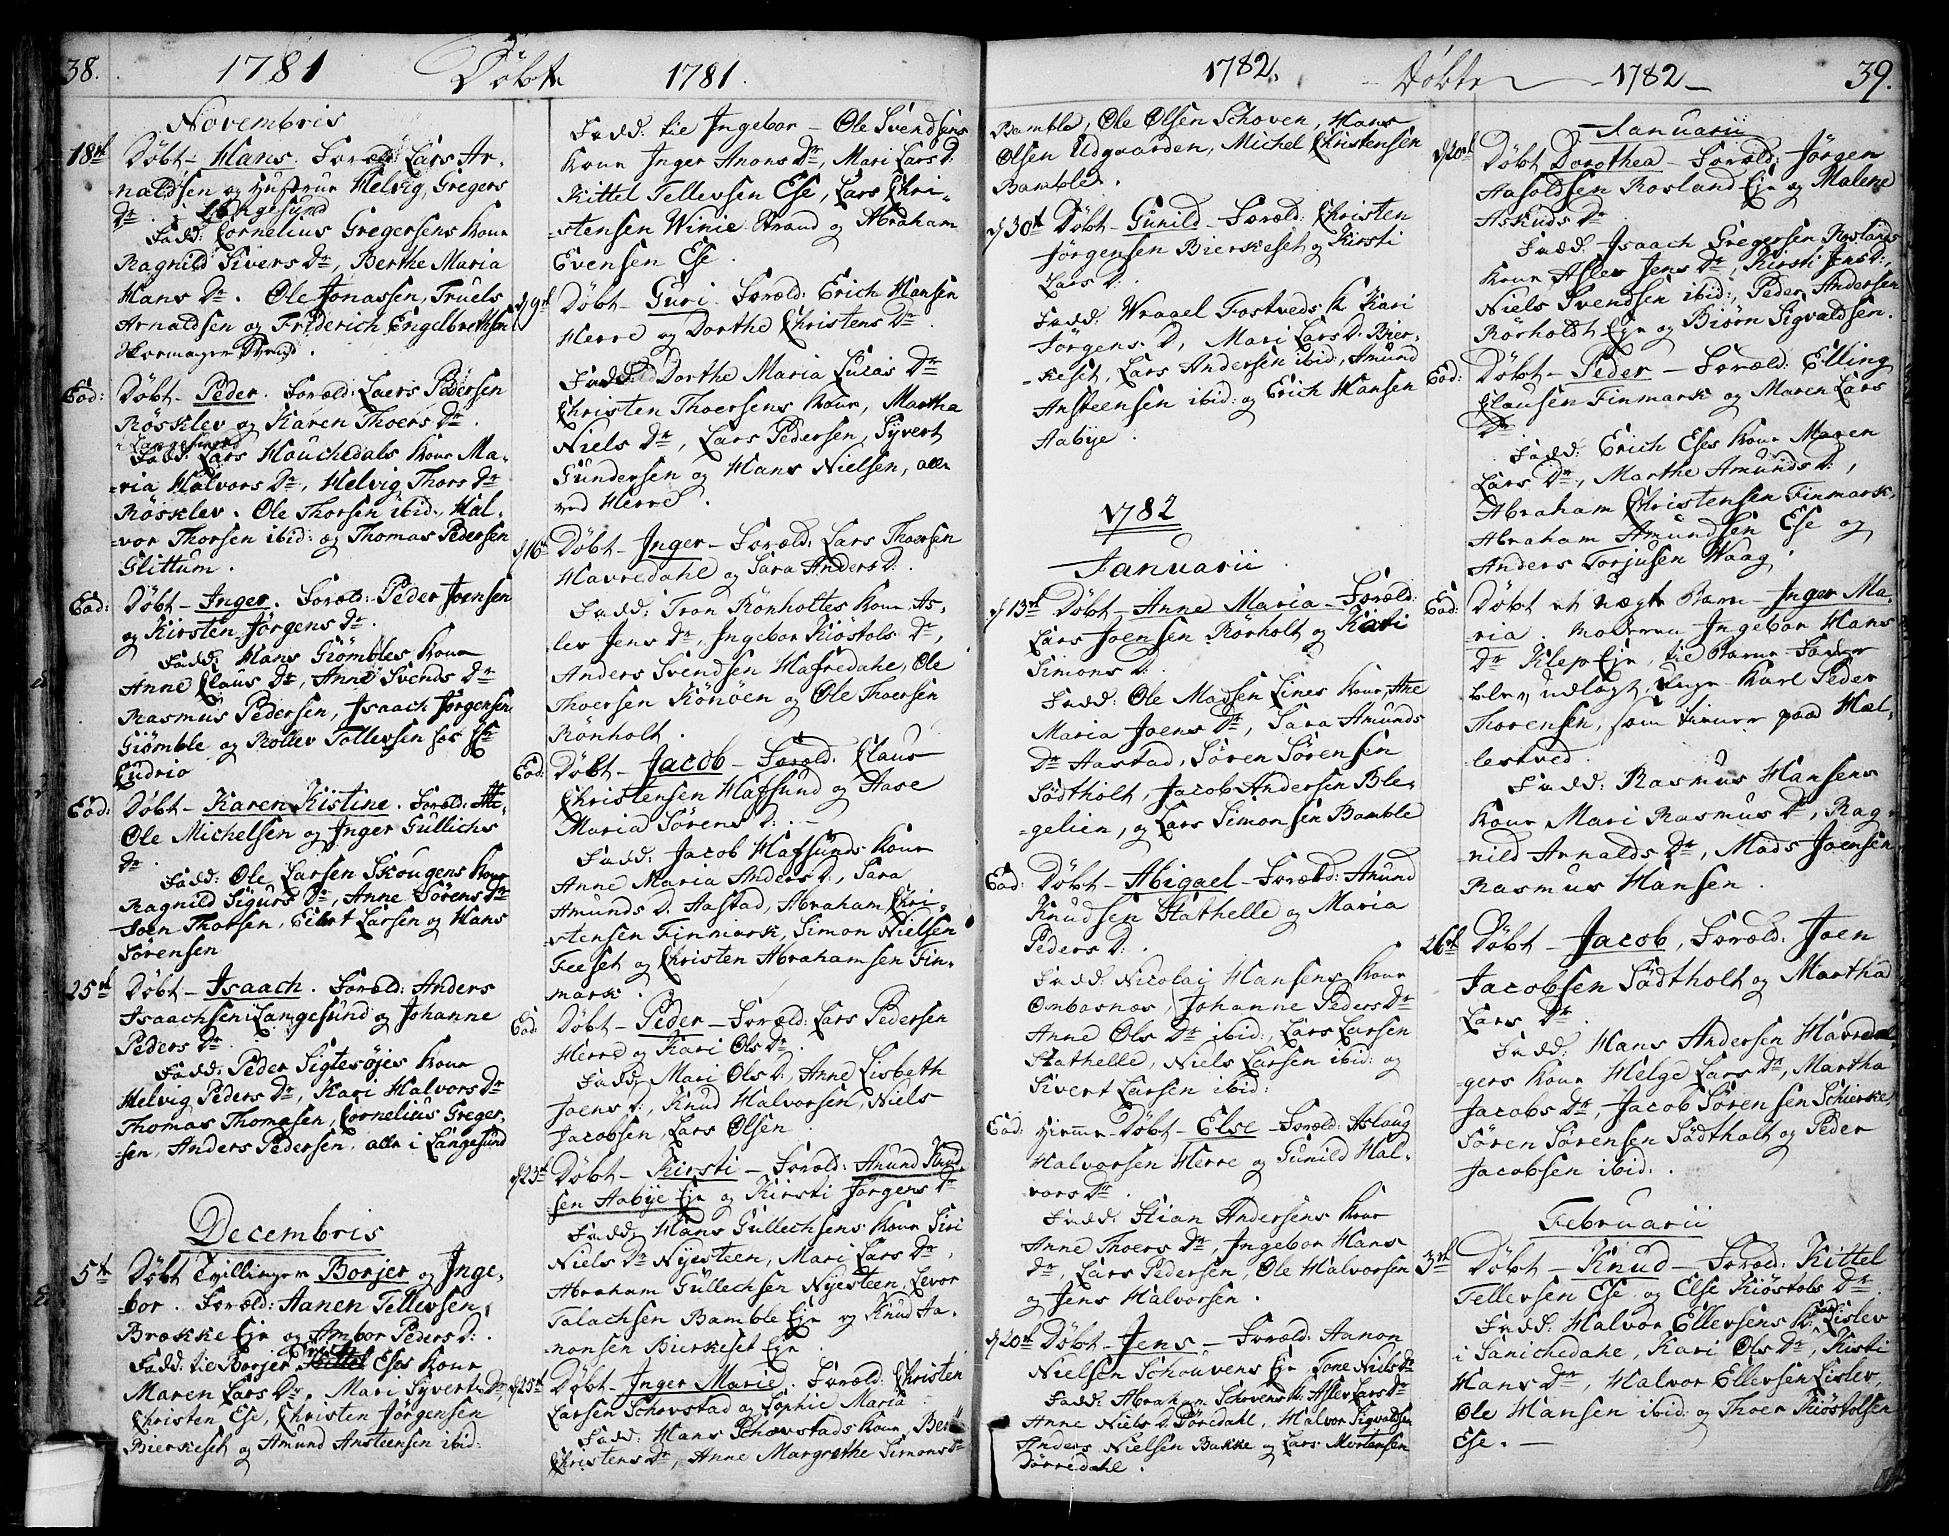 SAKO, Bamble kirkebøker, F/Fa/L0002: Ministerialbok nr. I 2, 1775-1814, s. 38-39